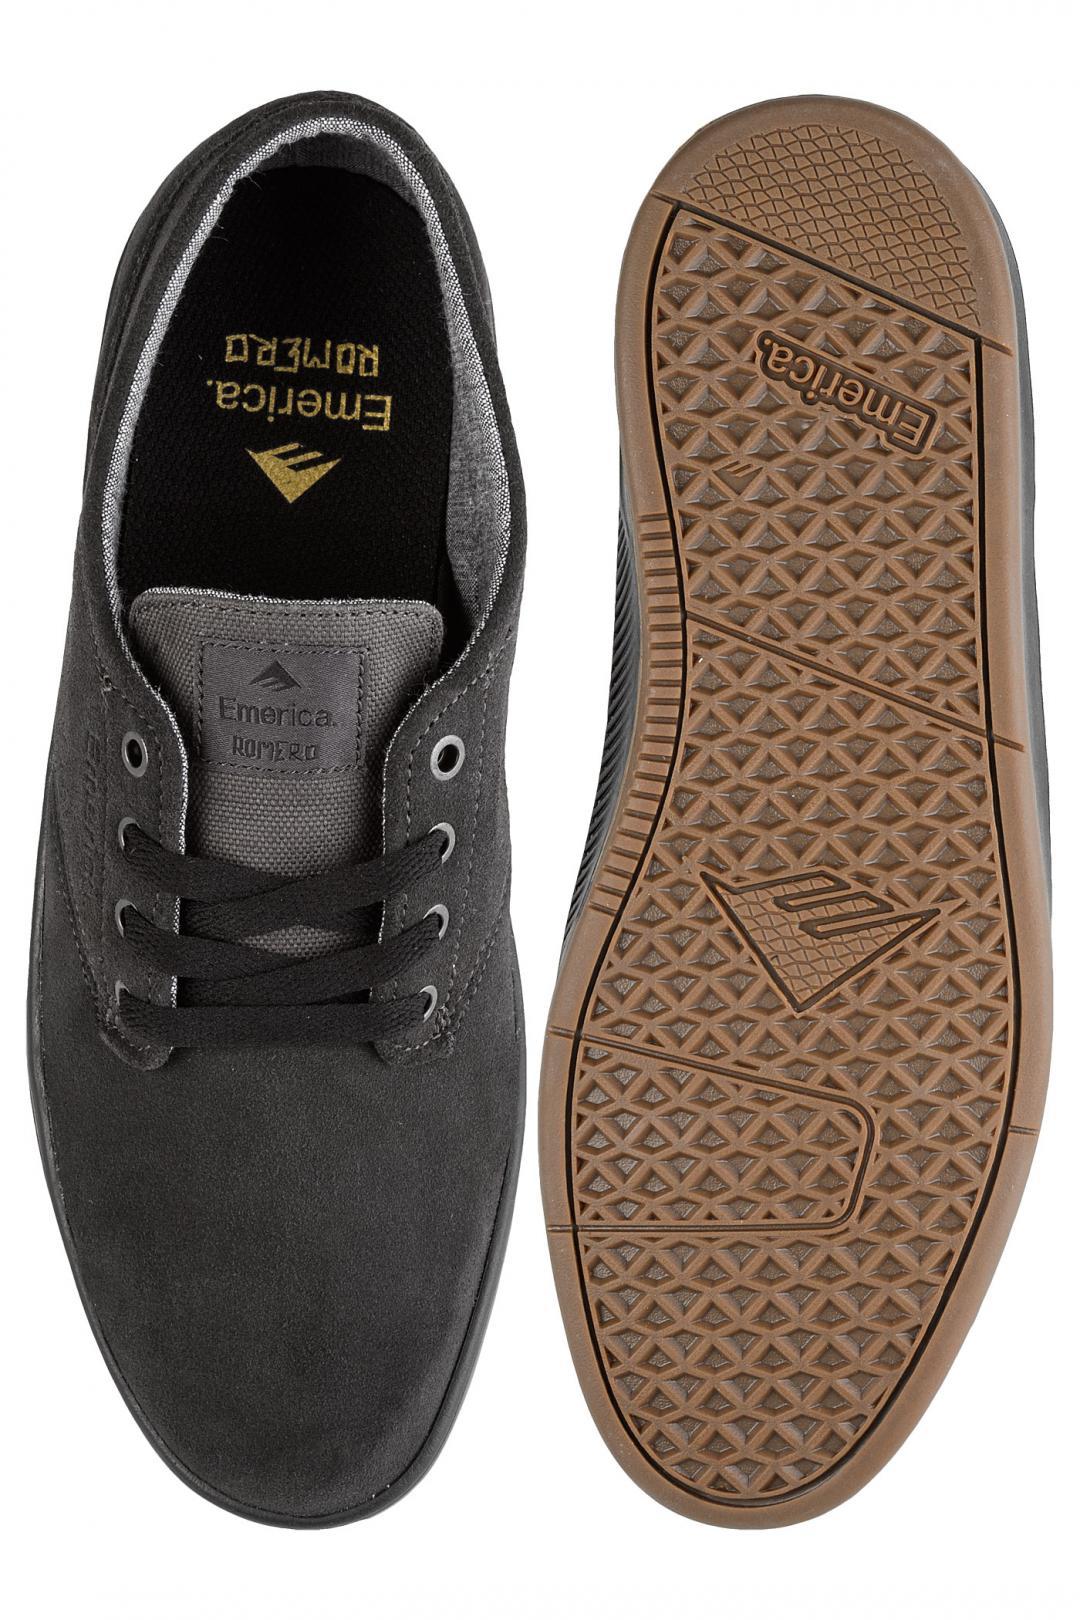 Uomo Emerica The Romero Laced dark grey black gum | Sneakers low top